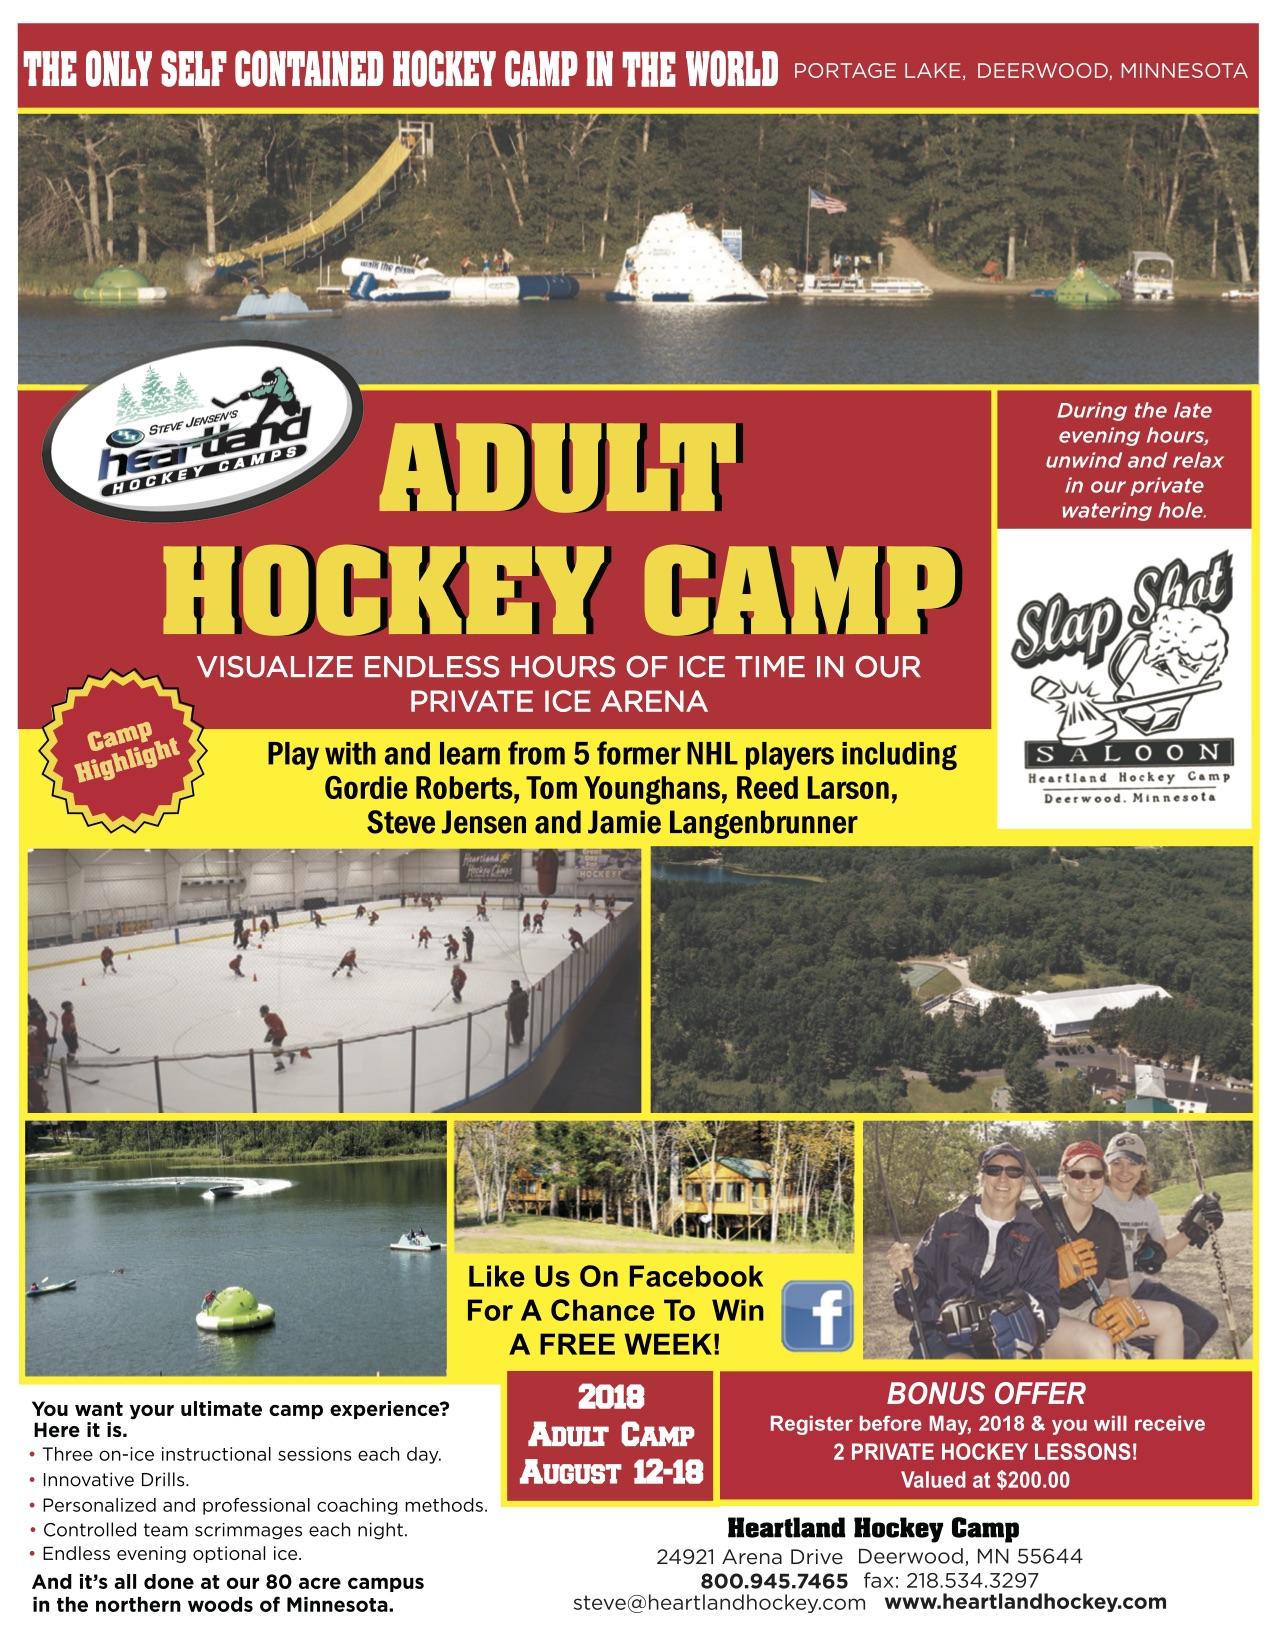 Adult Camp Hockey flyer